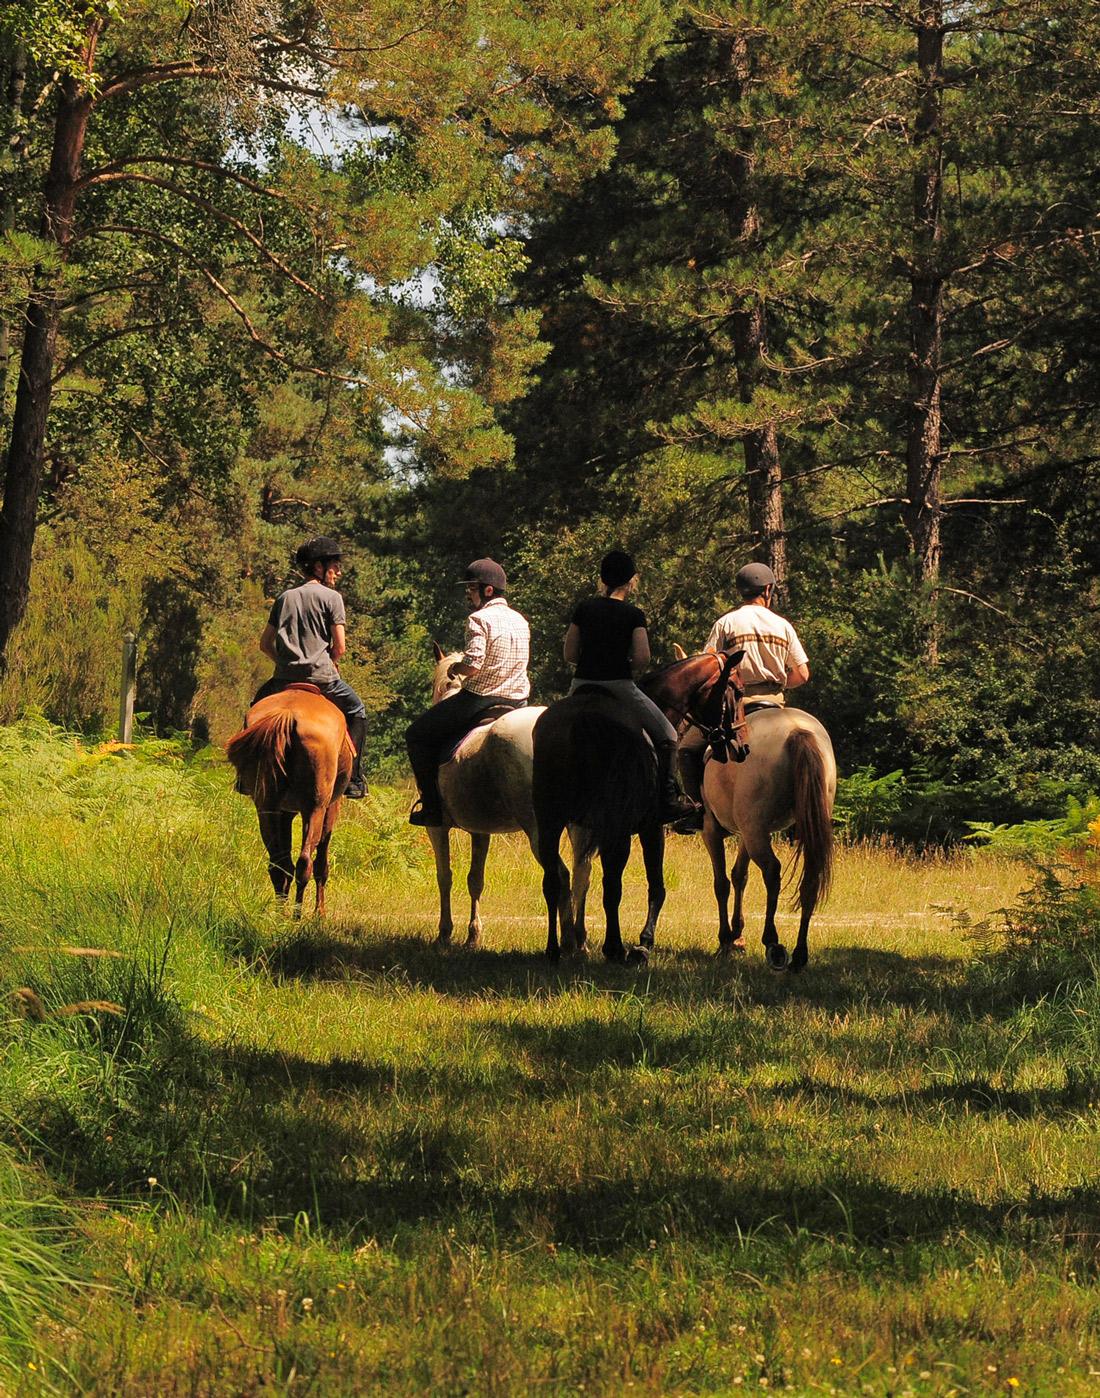 Horseback riding activity in Chambord.